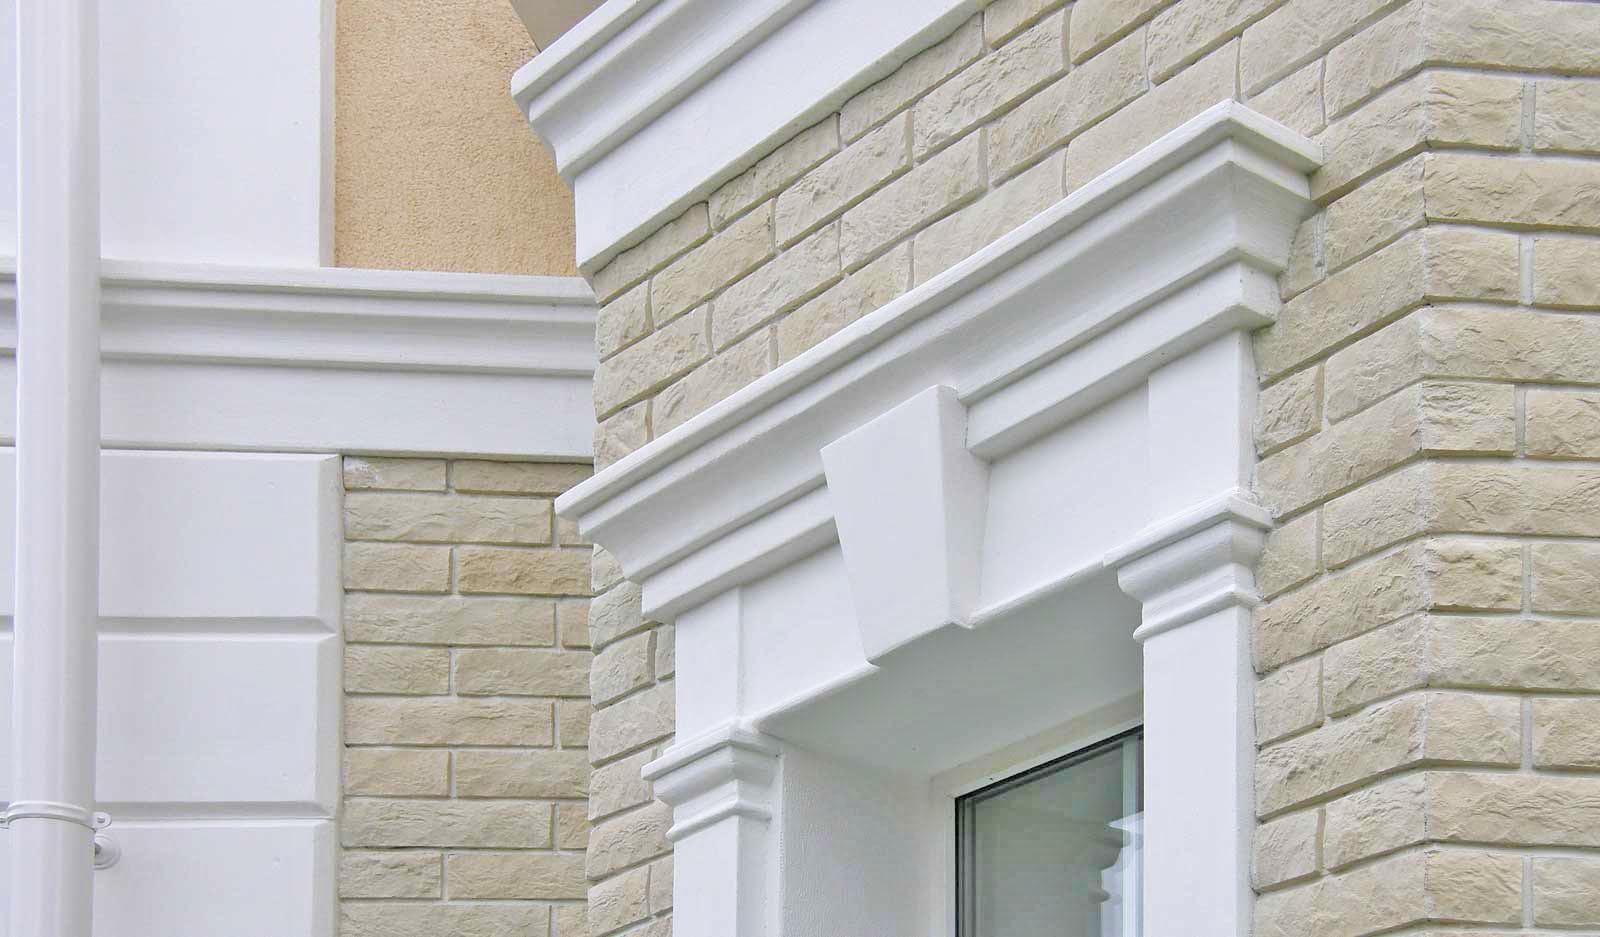 декоративный пенопласт для фасада